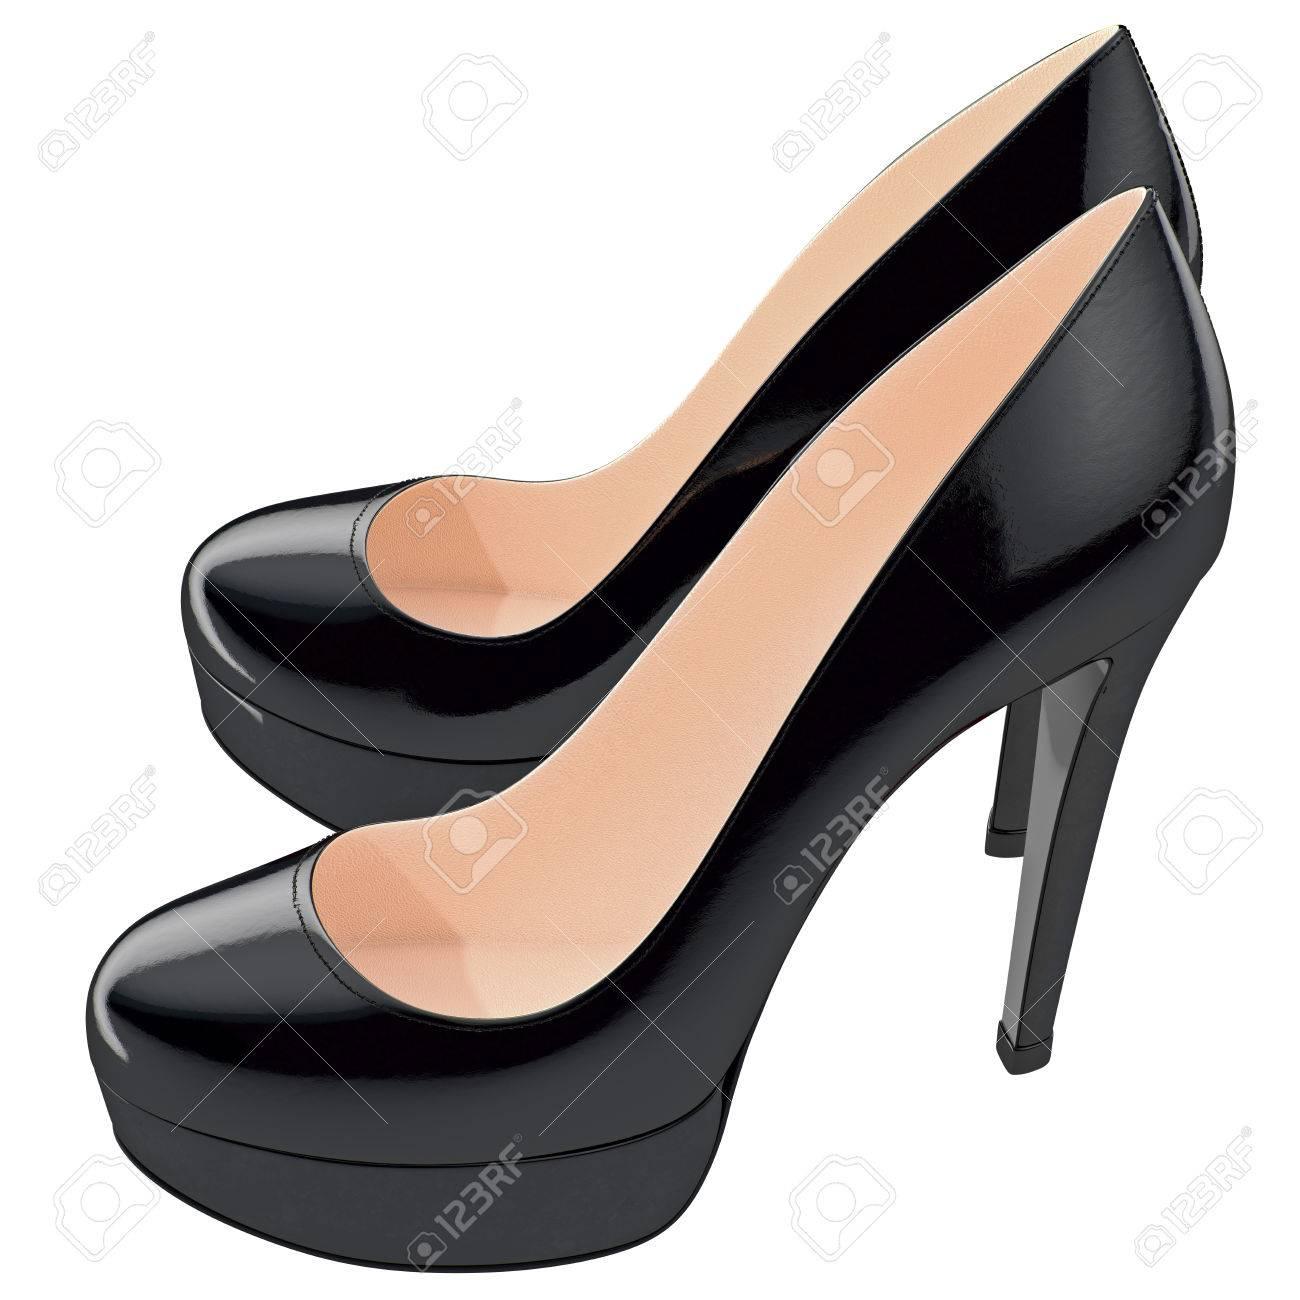 Altos De Negros Lackered Objeto 3d Mujeres Tacones Zapatos Las En E50wnqqF